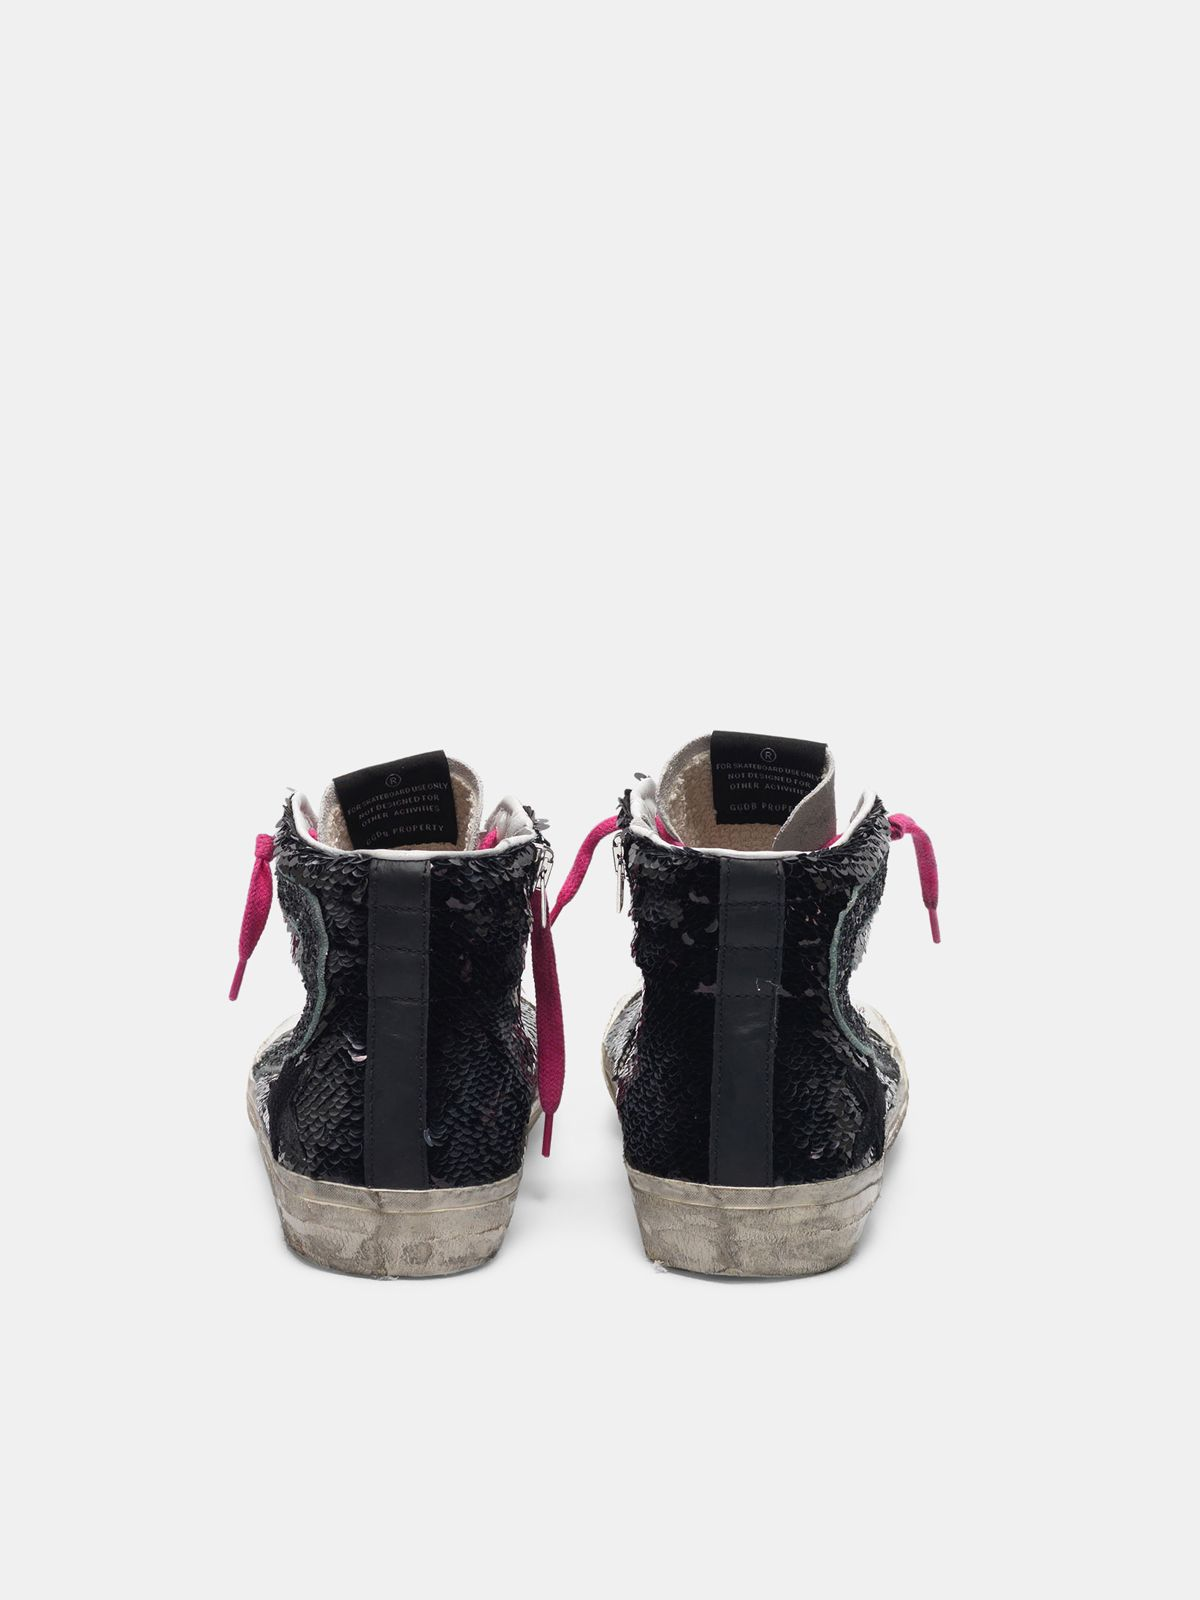 Golden Goose - Zapatillas deportivas con lentejuelas negras in